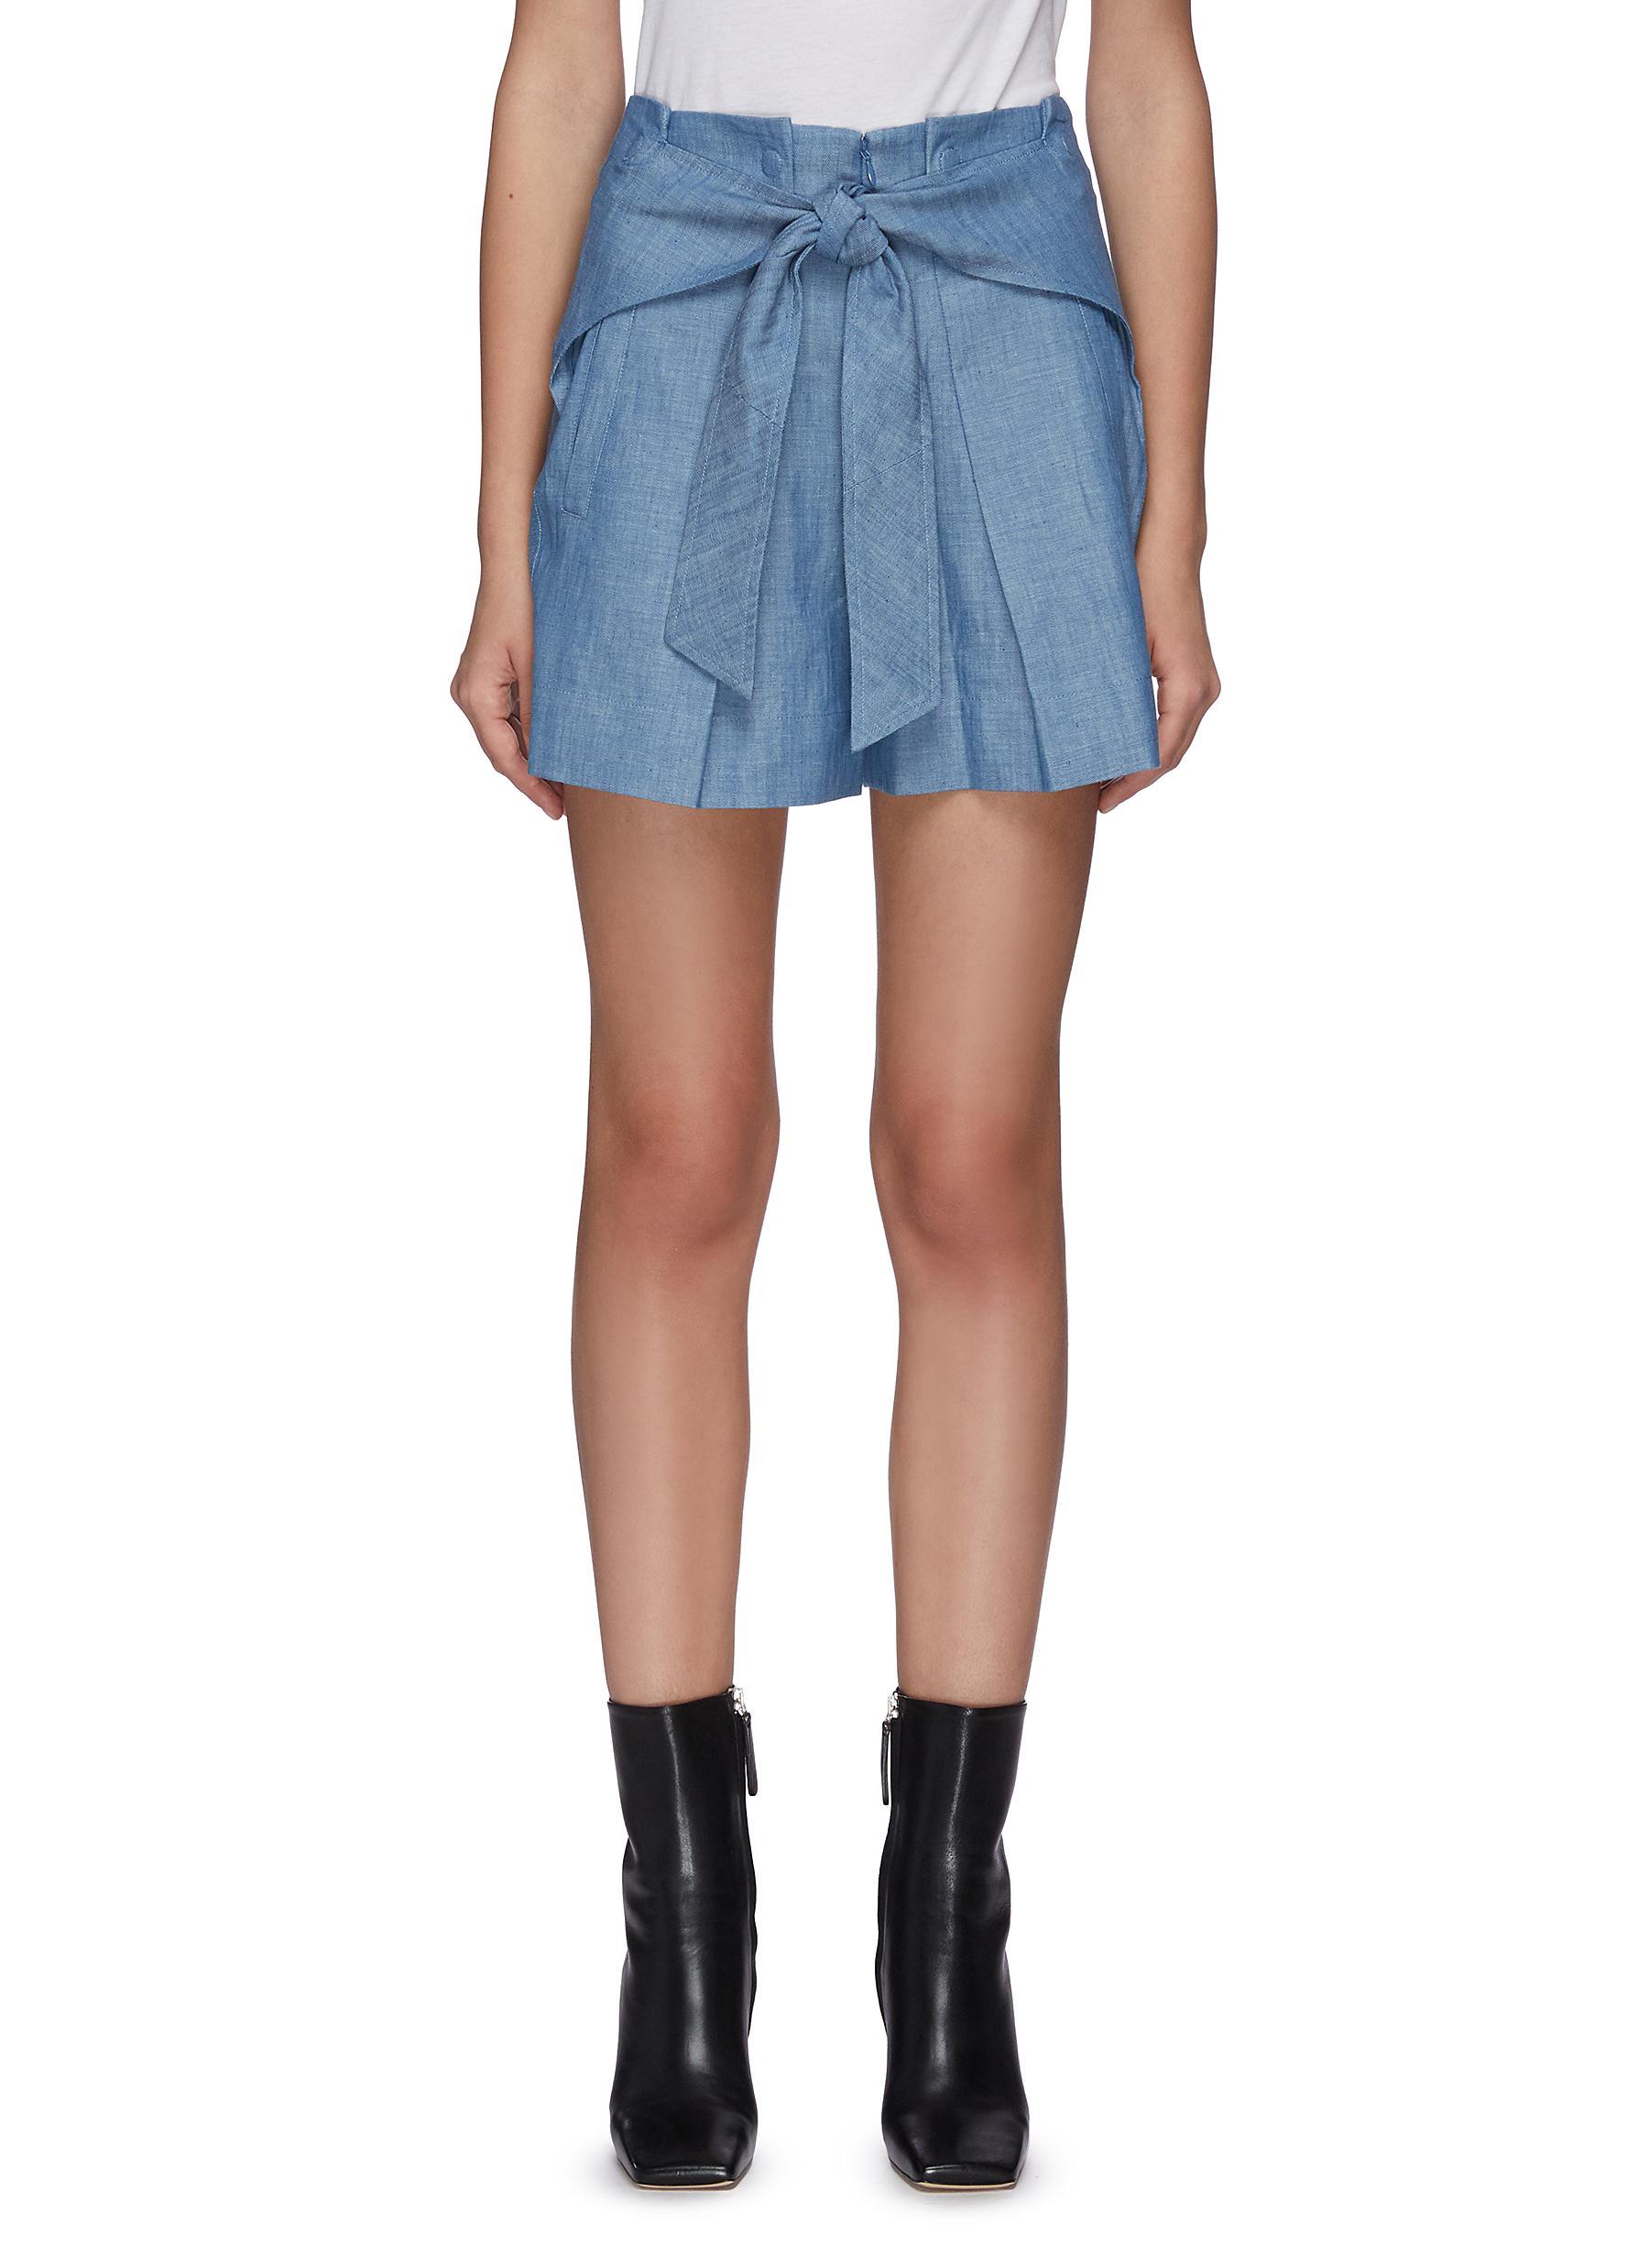 Belted patch pocket chambray shorts - 3.1 PHILLIP LIM - Modalova